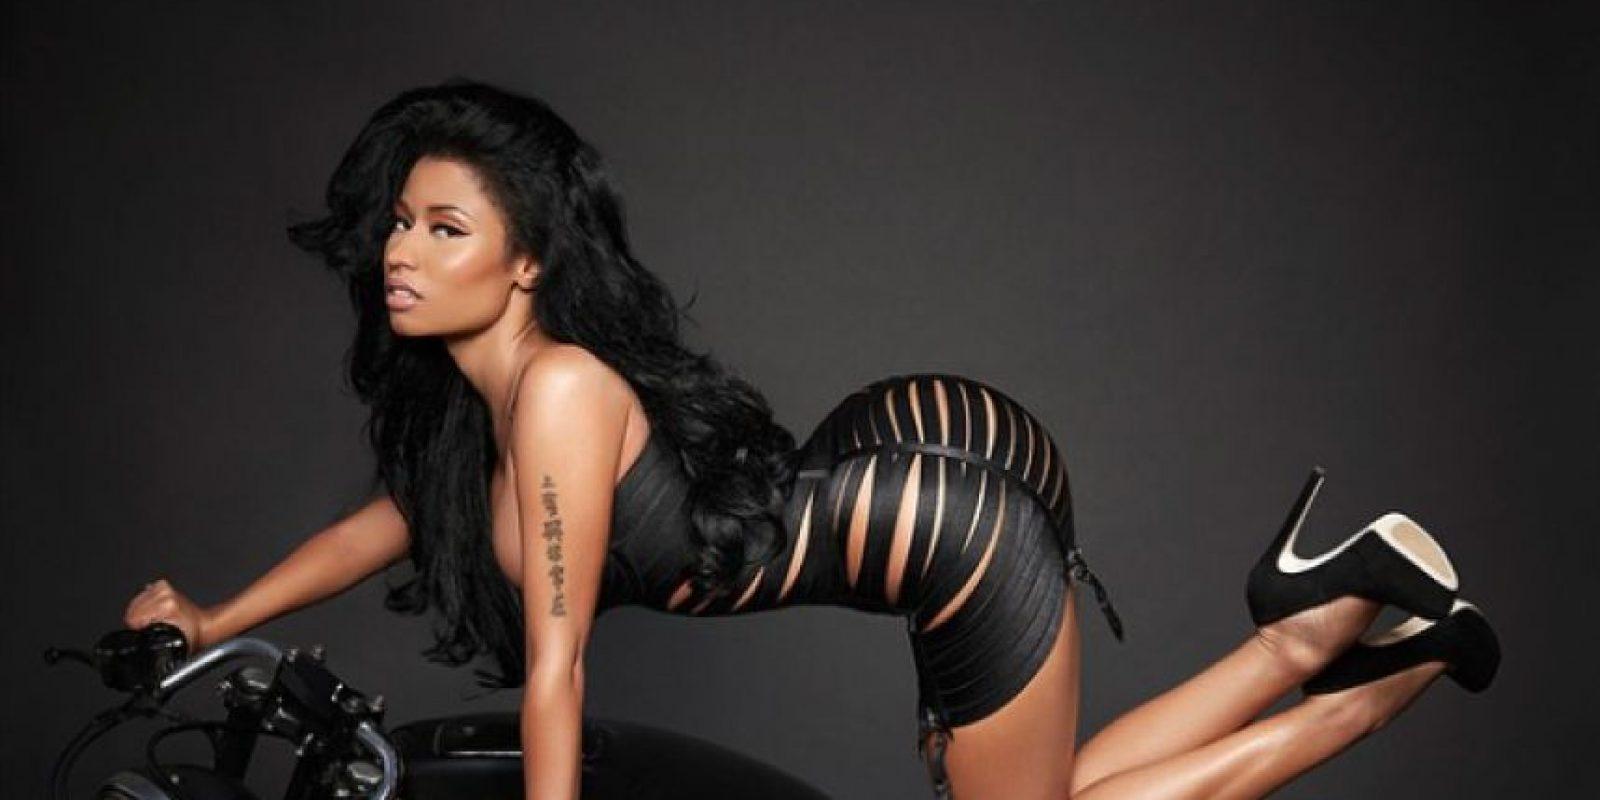 Foto:Istagram/Nicki Minaj